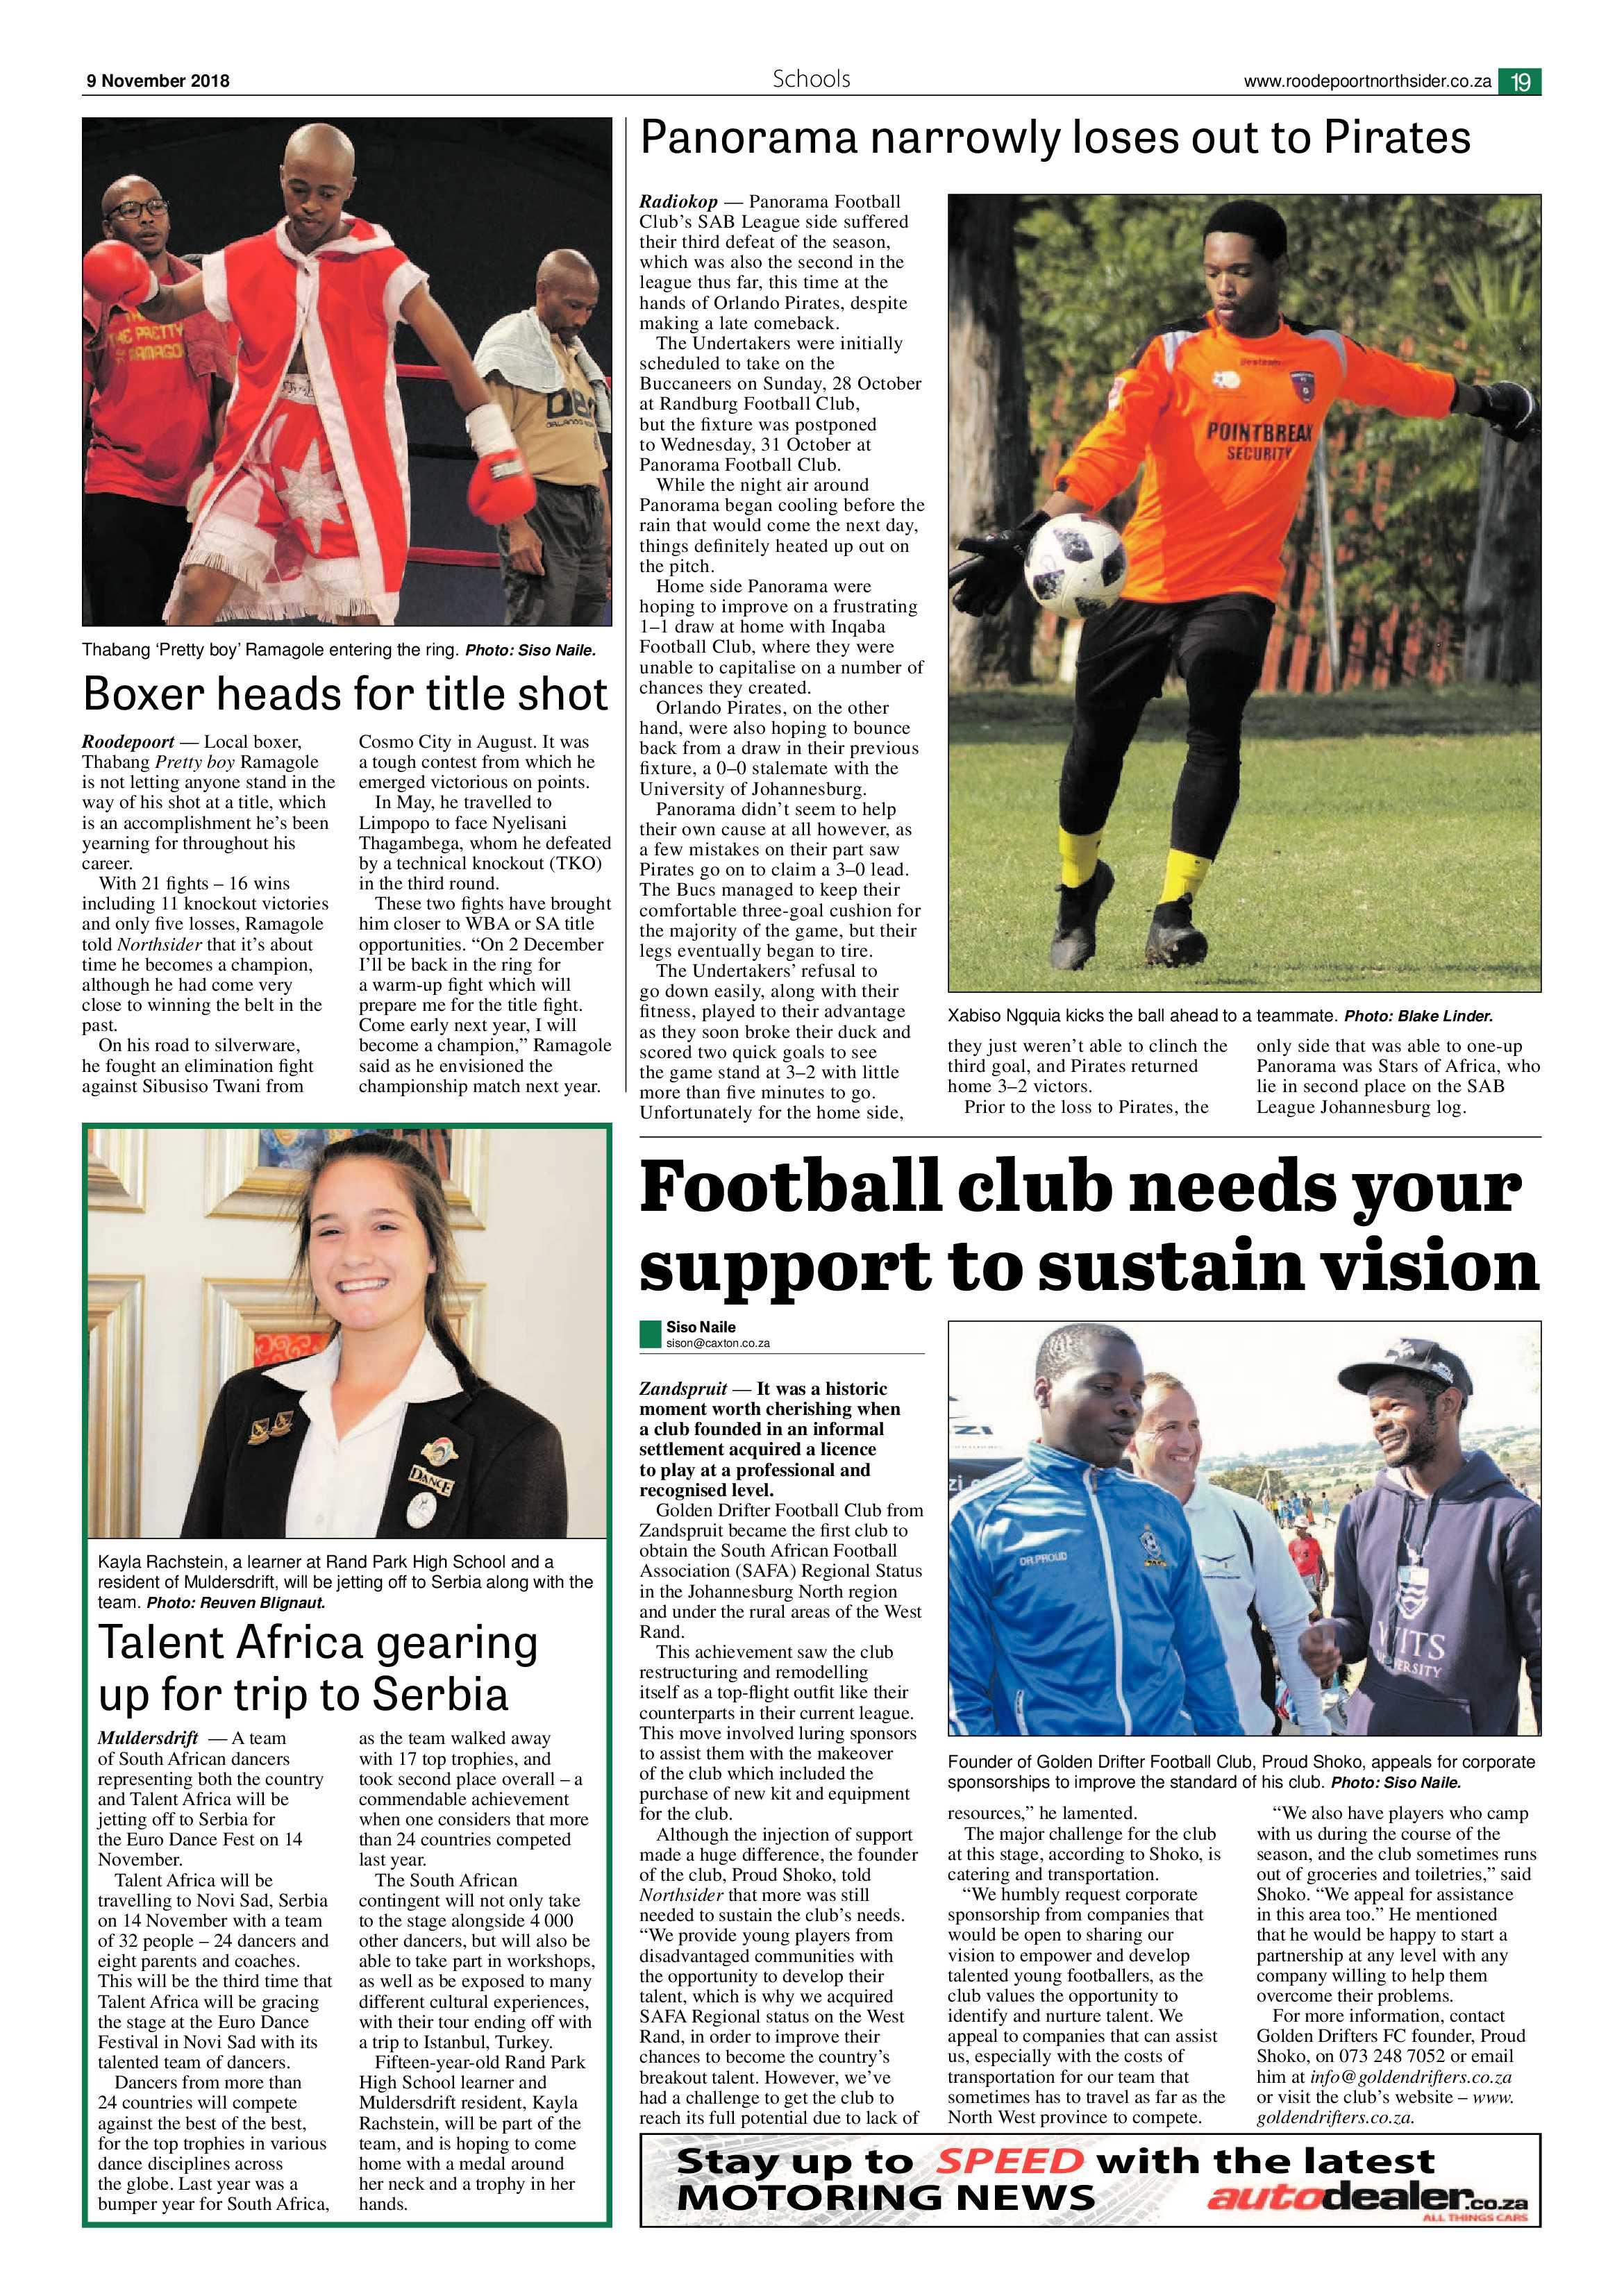 roodepoort-northsider-9-november-2018-epapers-page-19